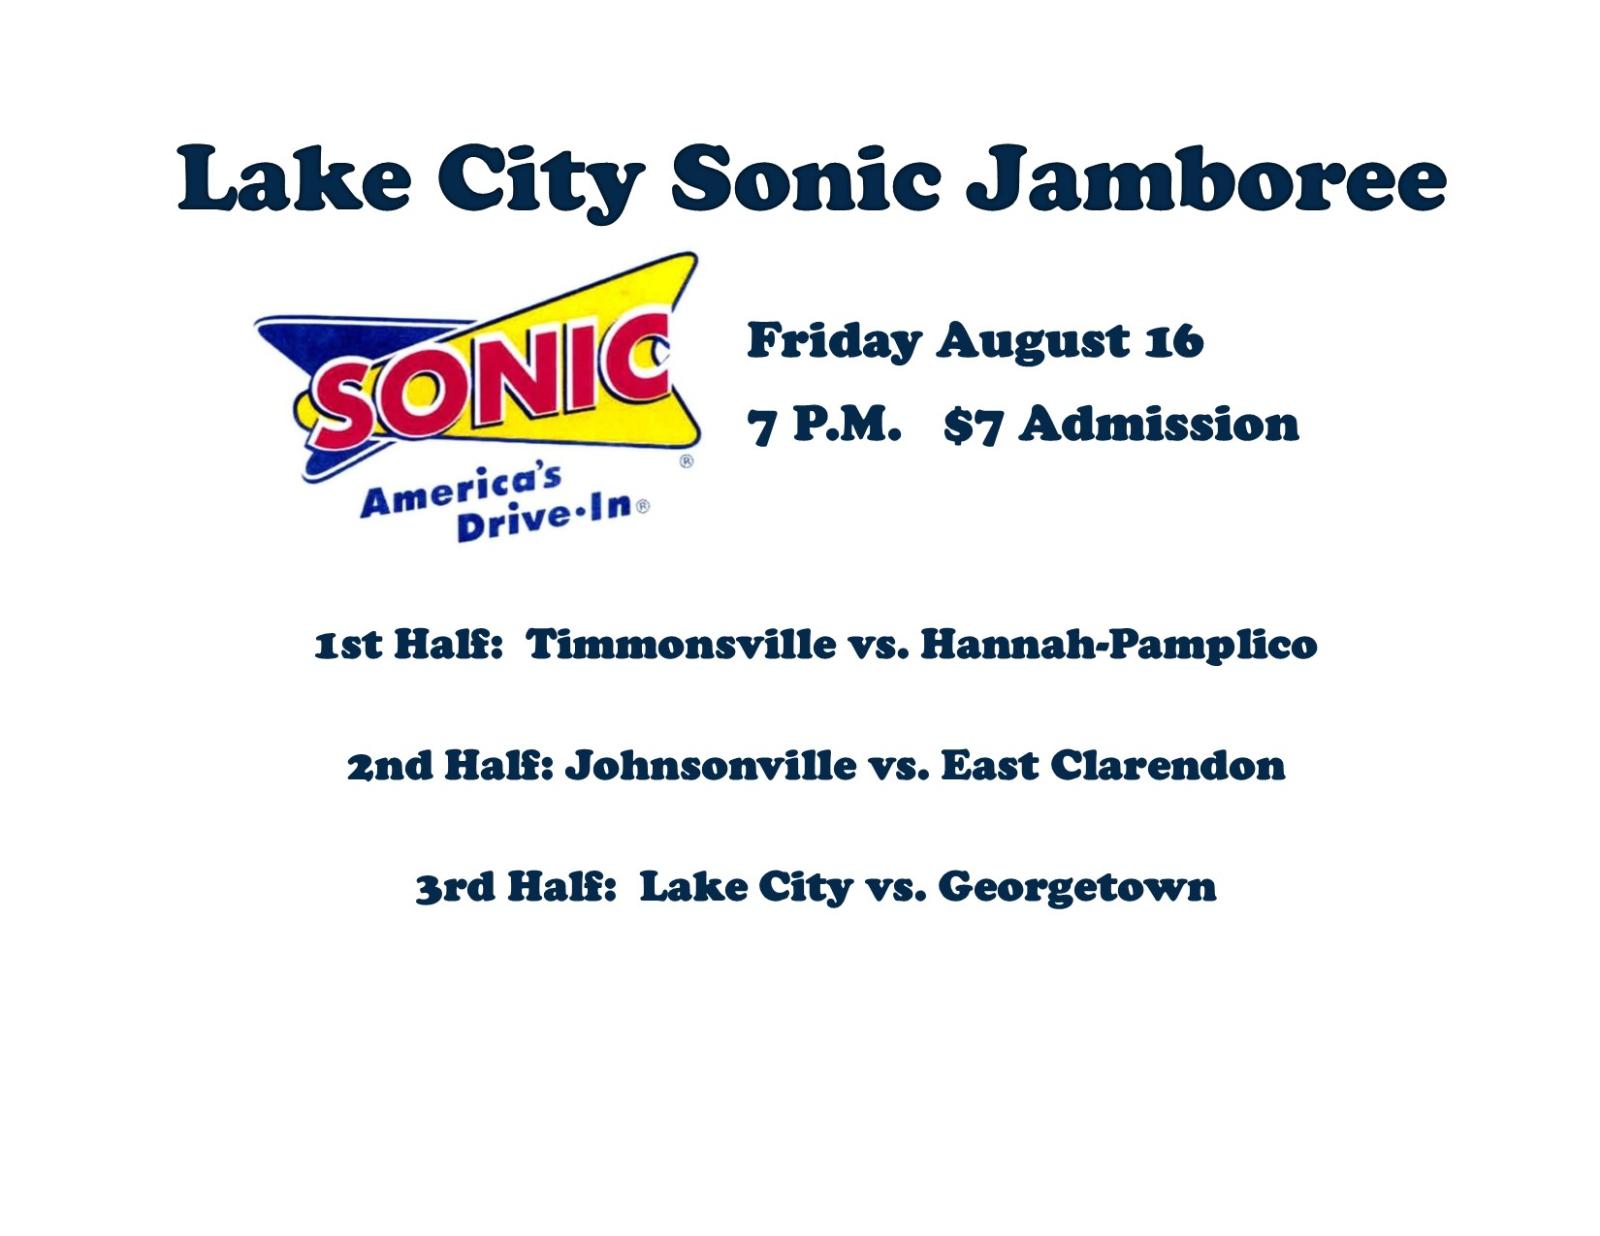 Lake City Sonic Jamboree Schedule